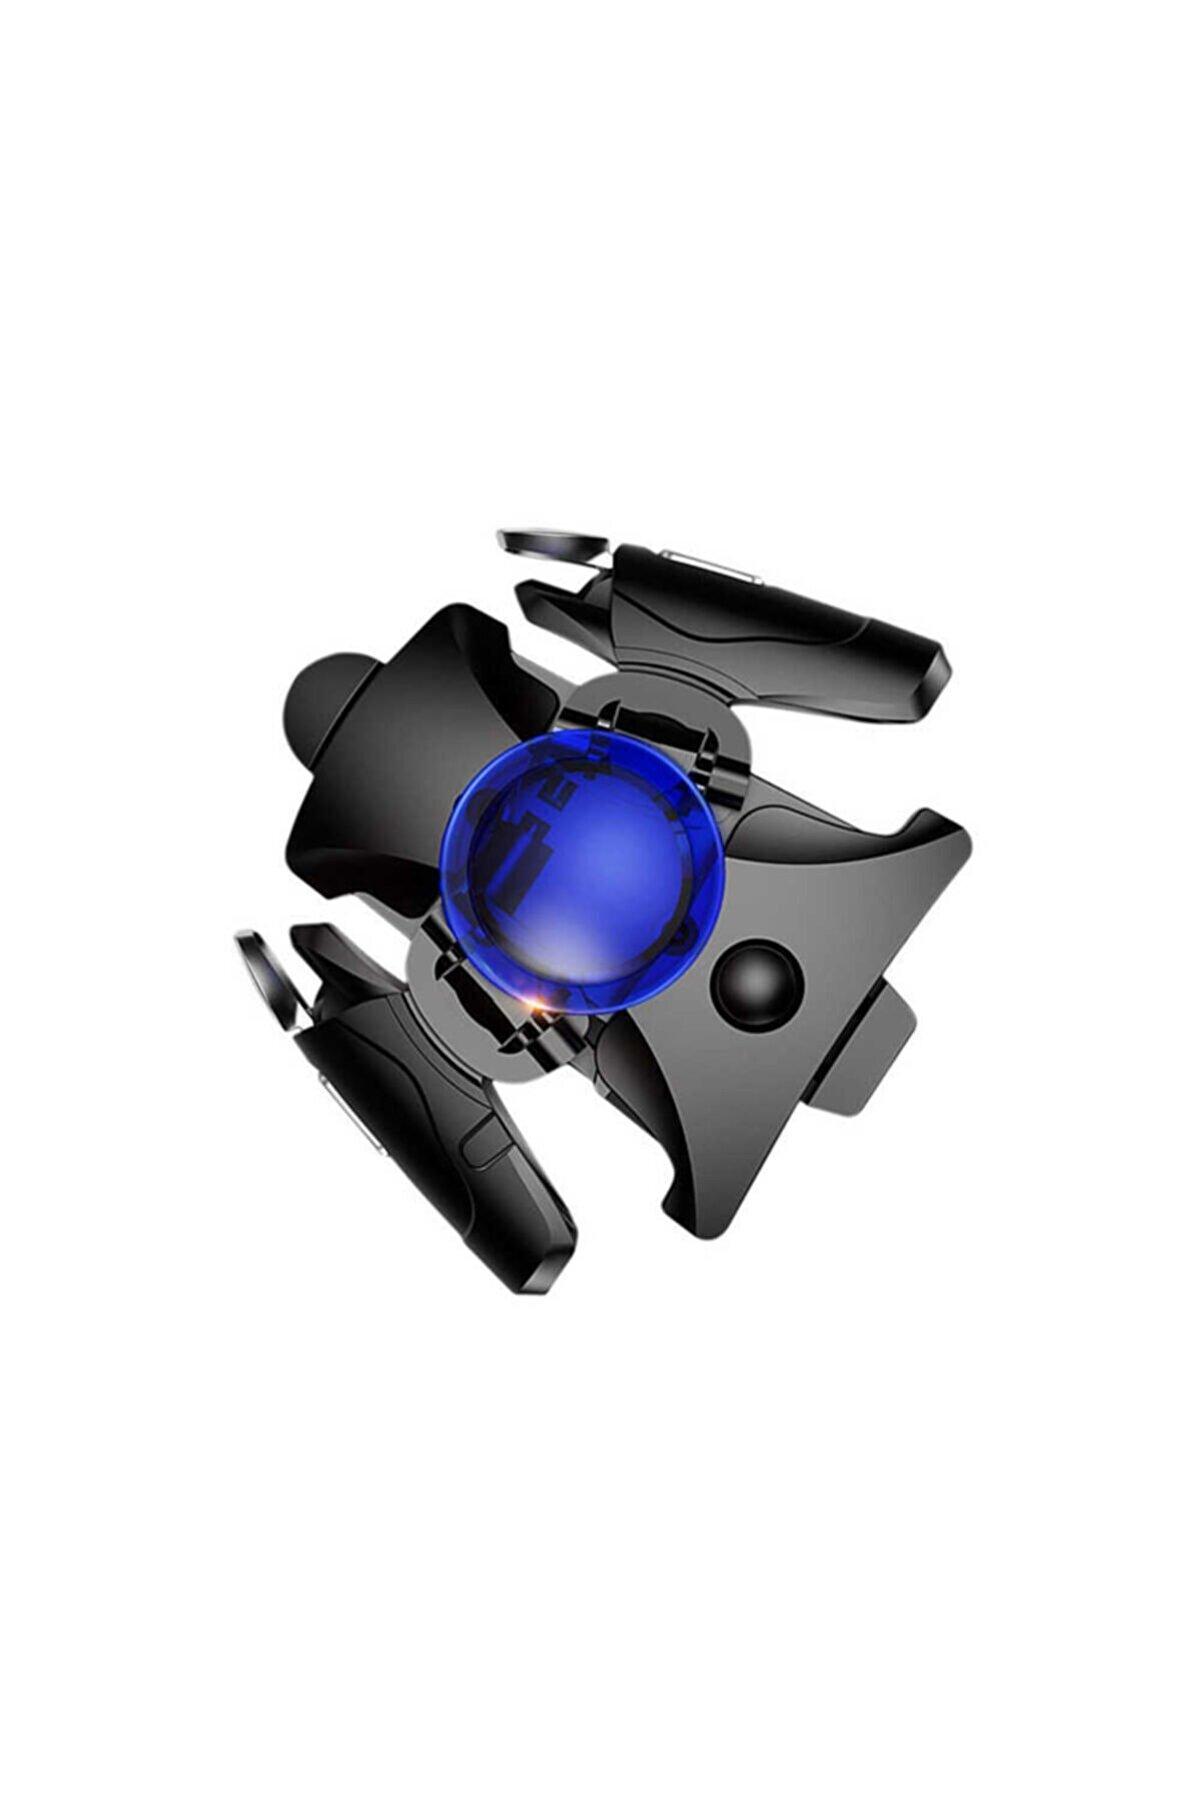 Letang Manyetik Seri Tetik Şarjlı Pubg Tetik